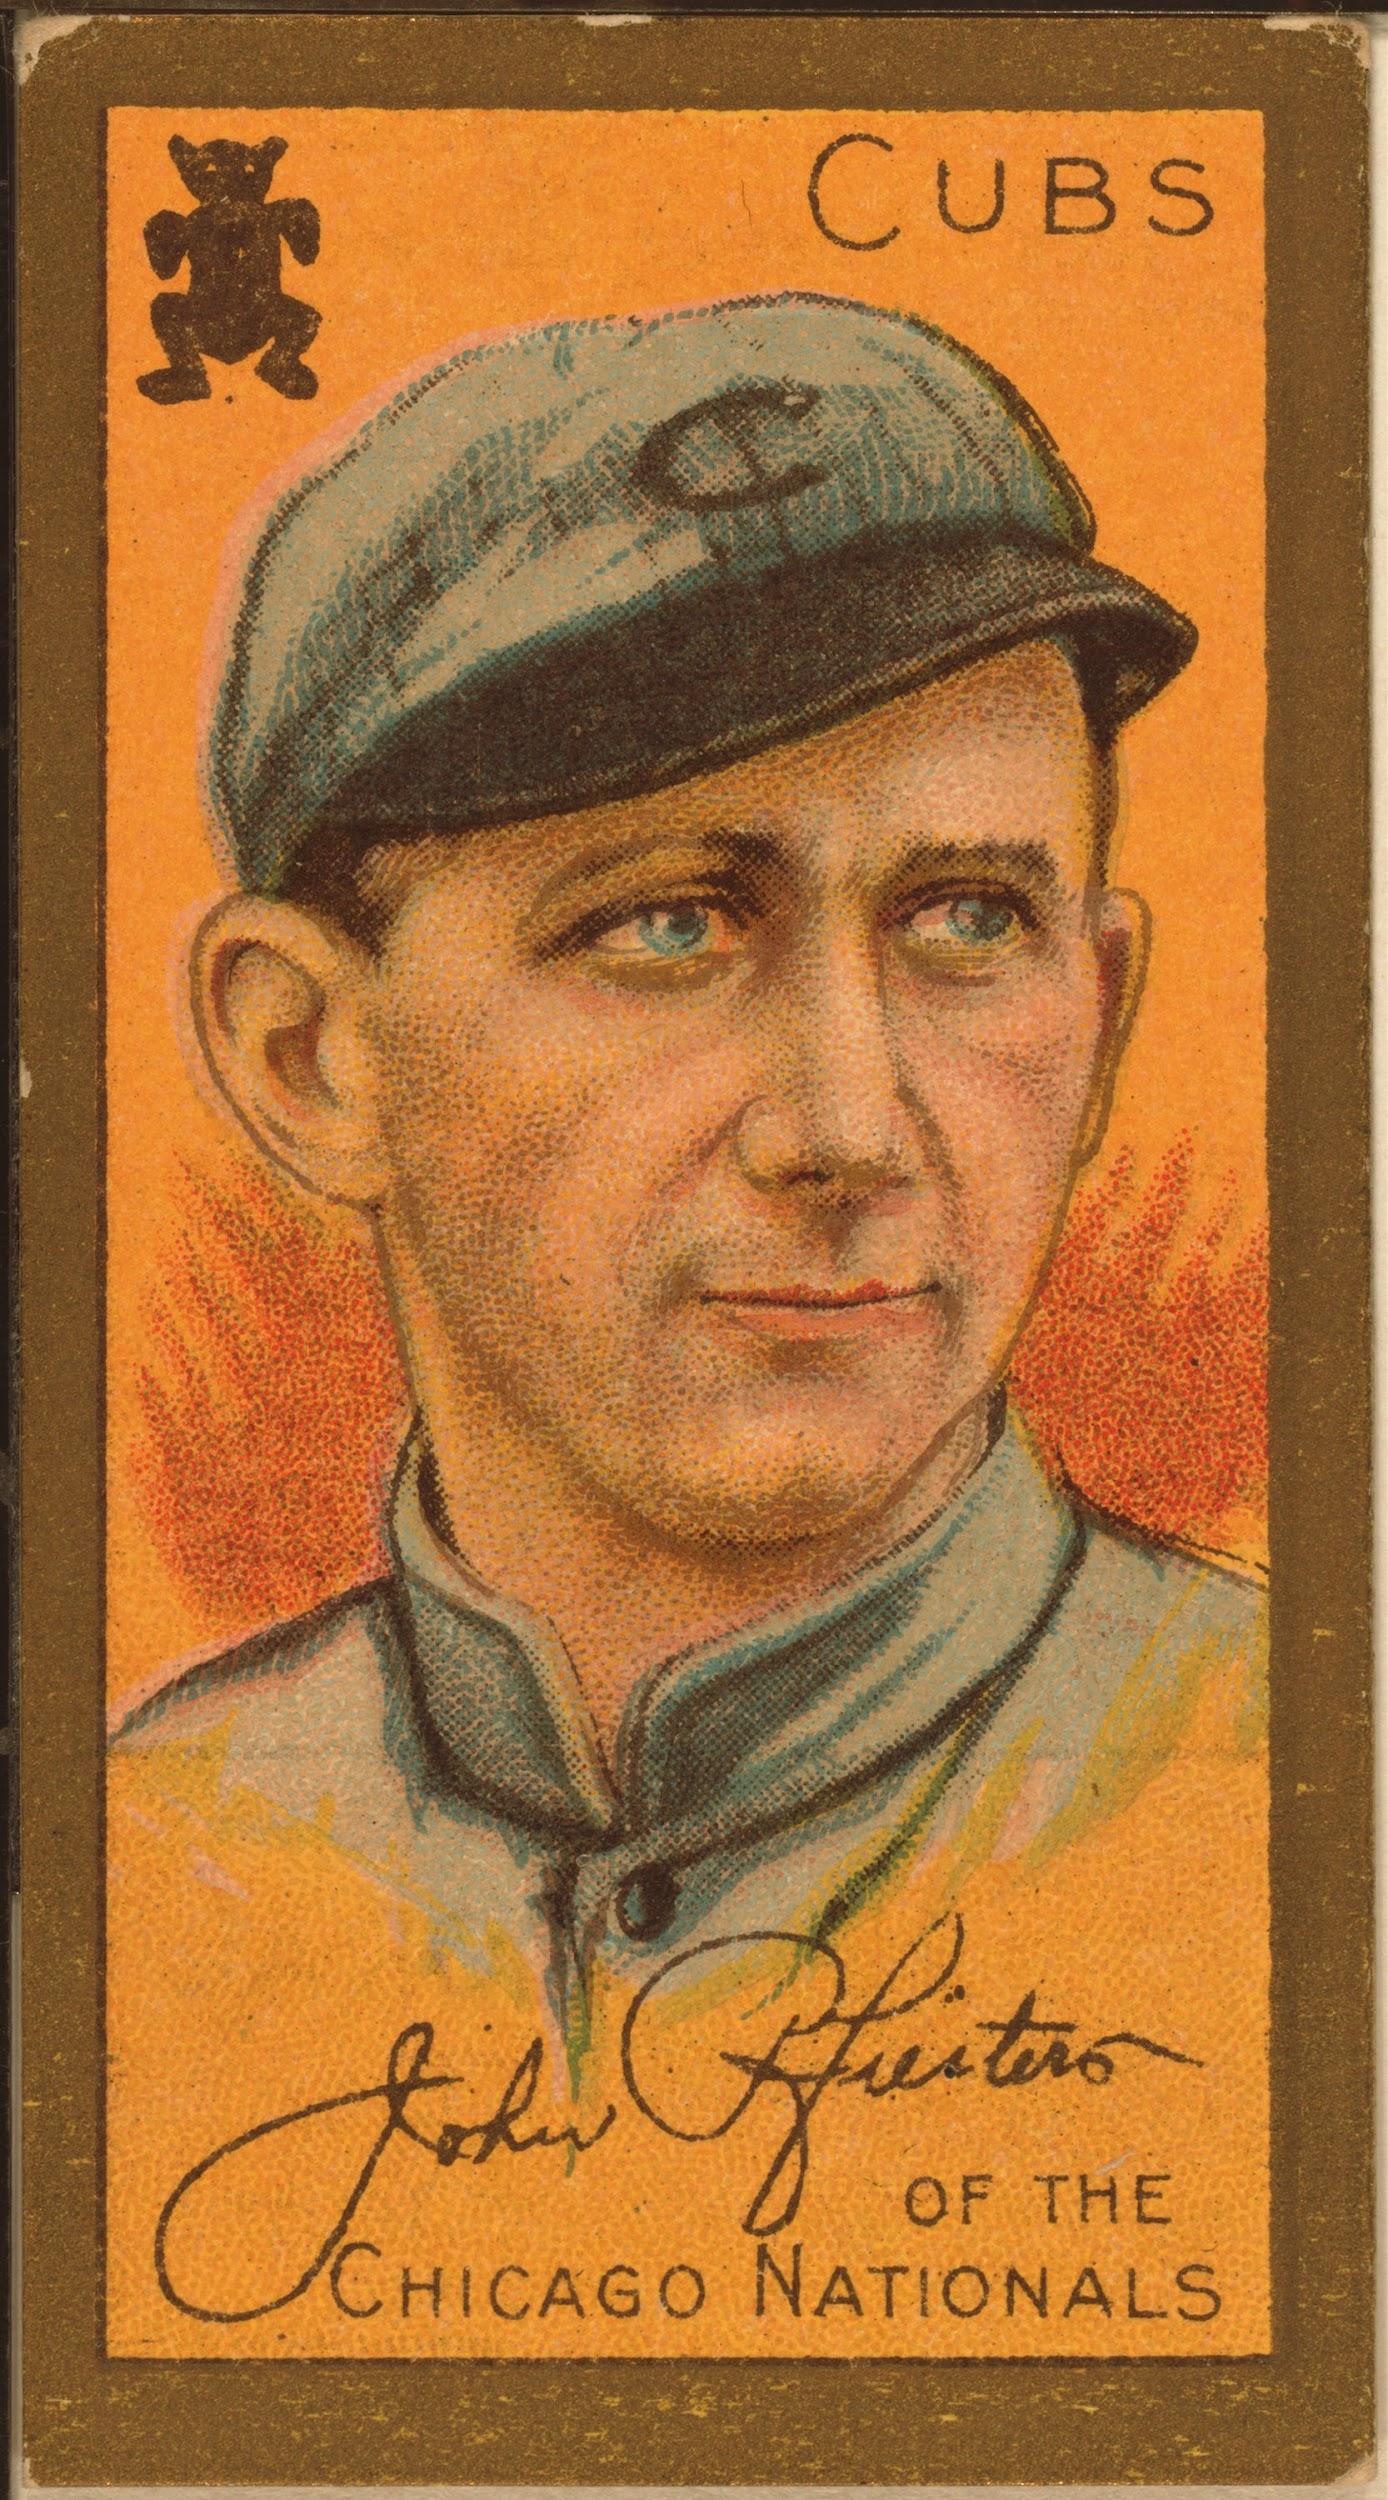 Jack_Pfiester_baseball_card.jpg